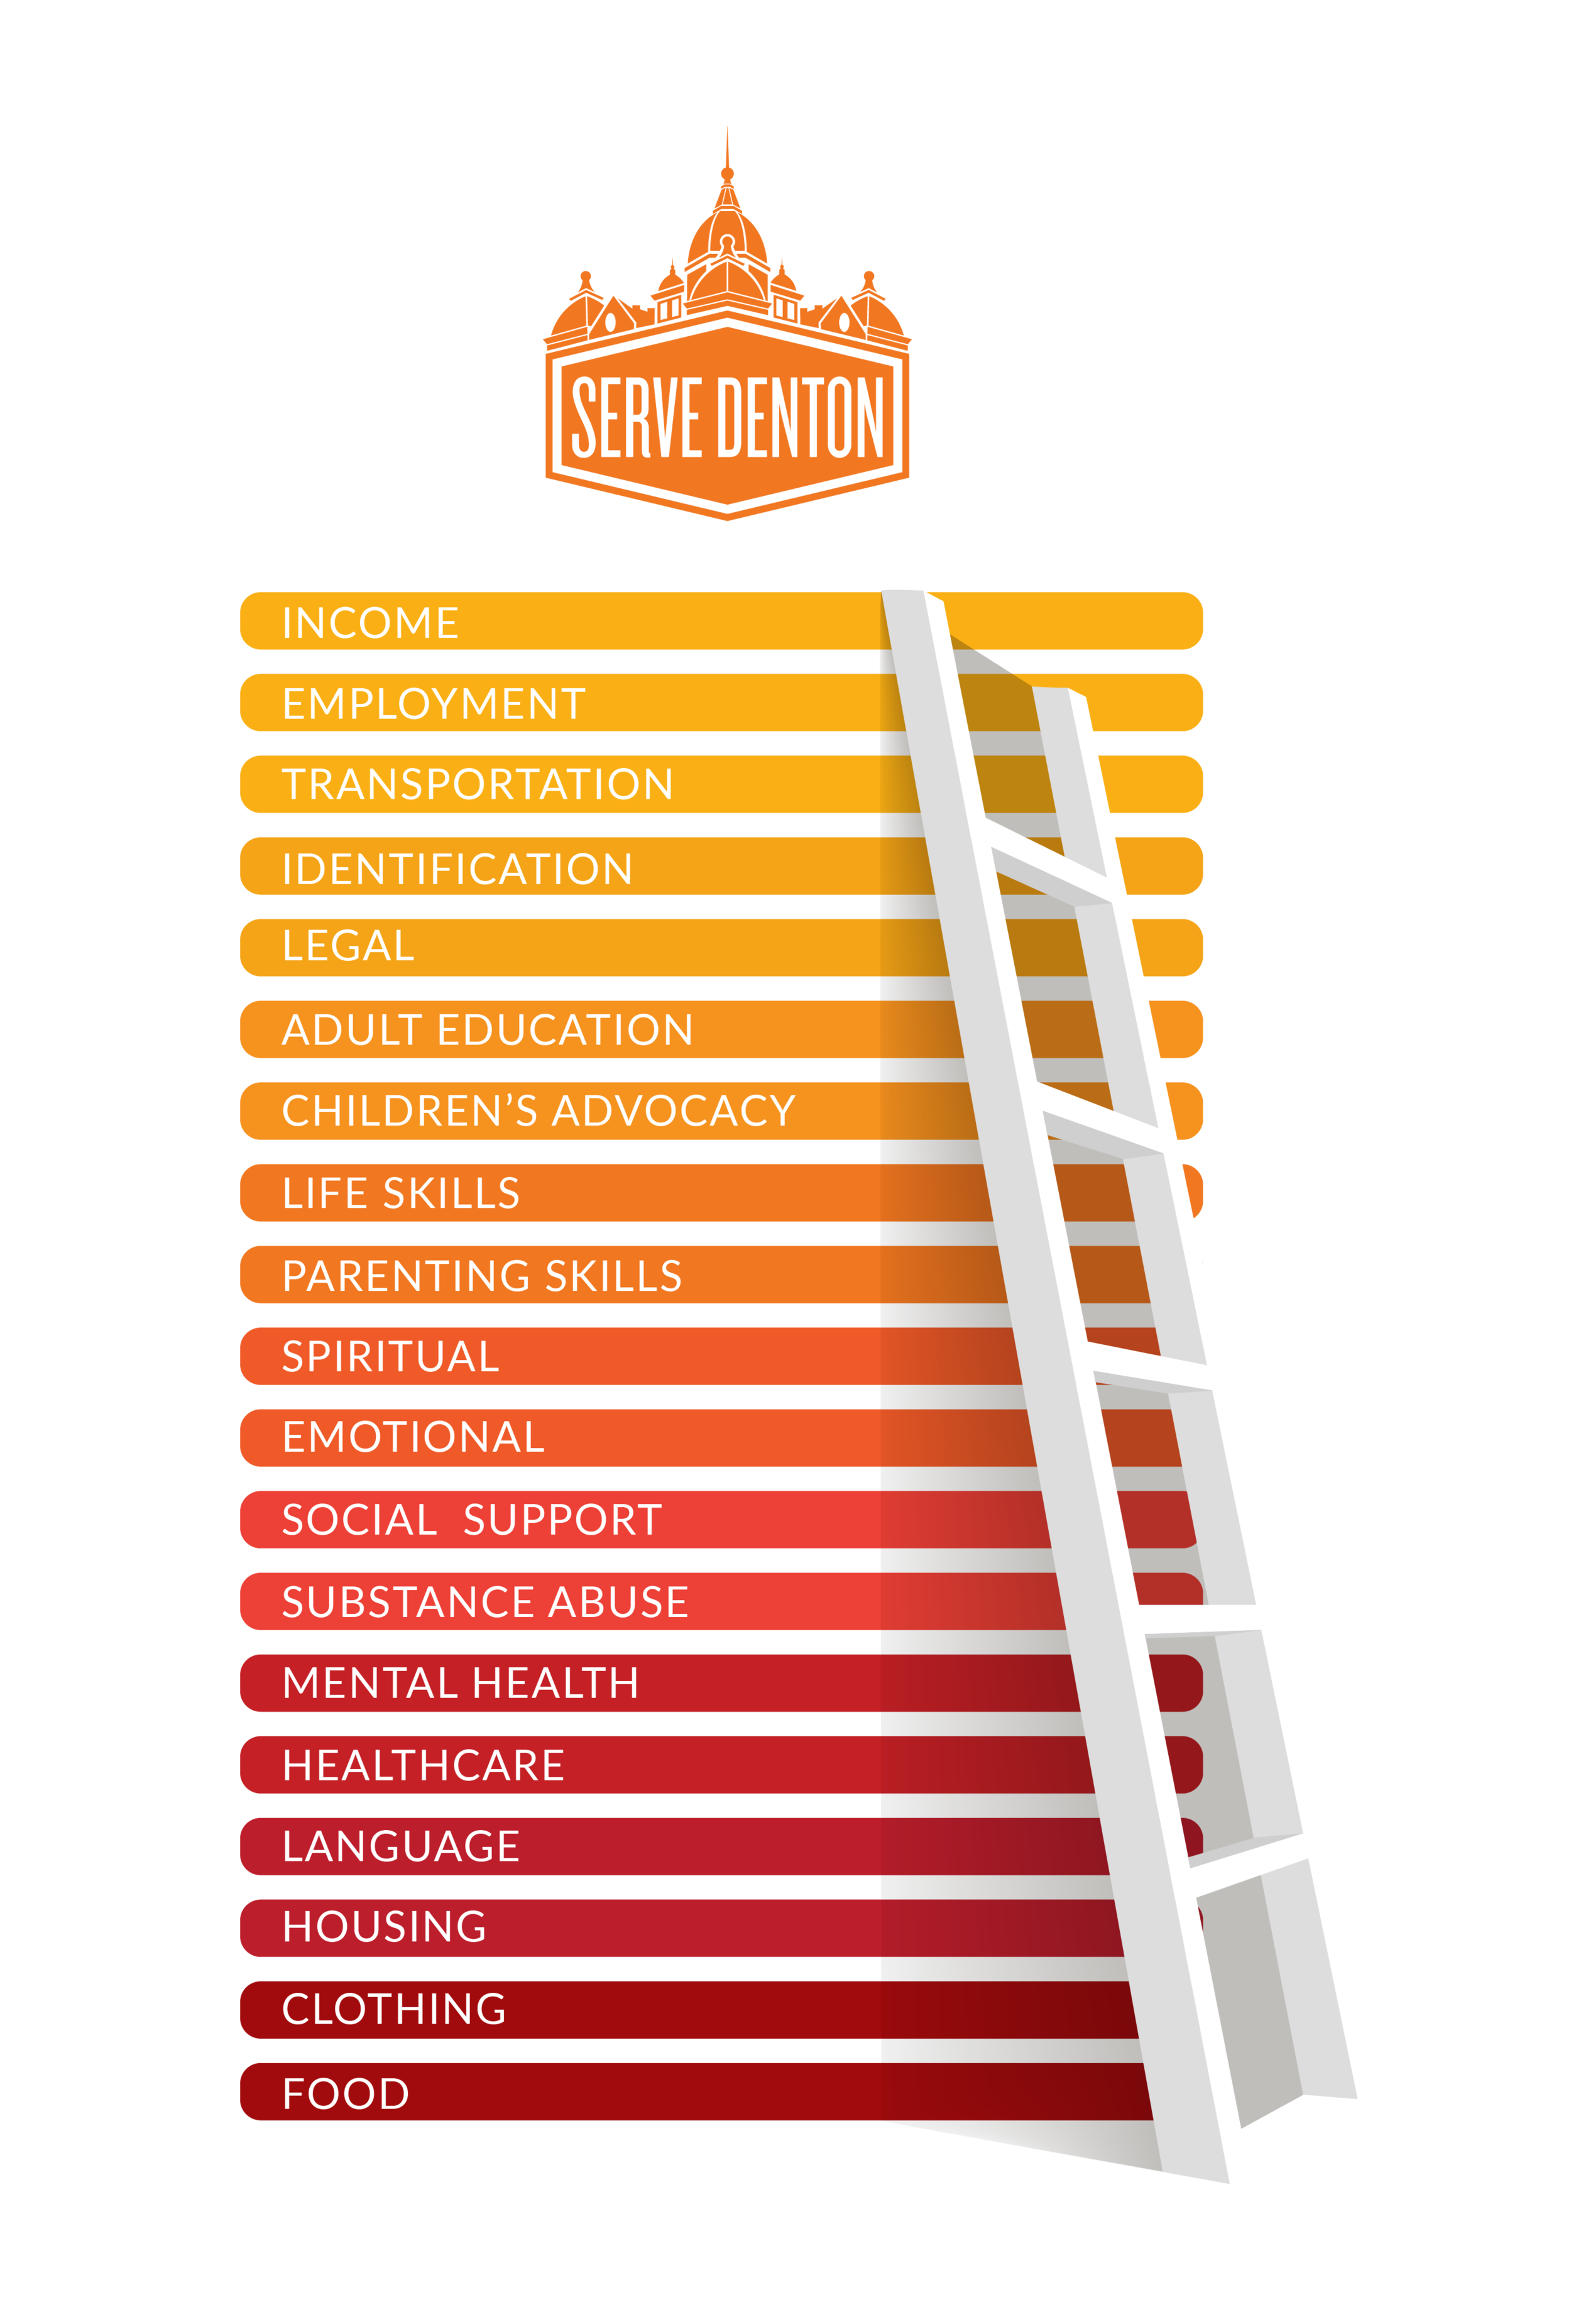 Serve Denton Self-Sufficiency Ladder